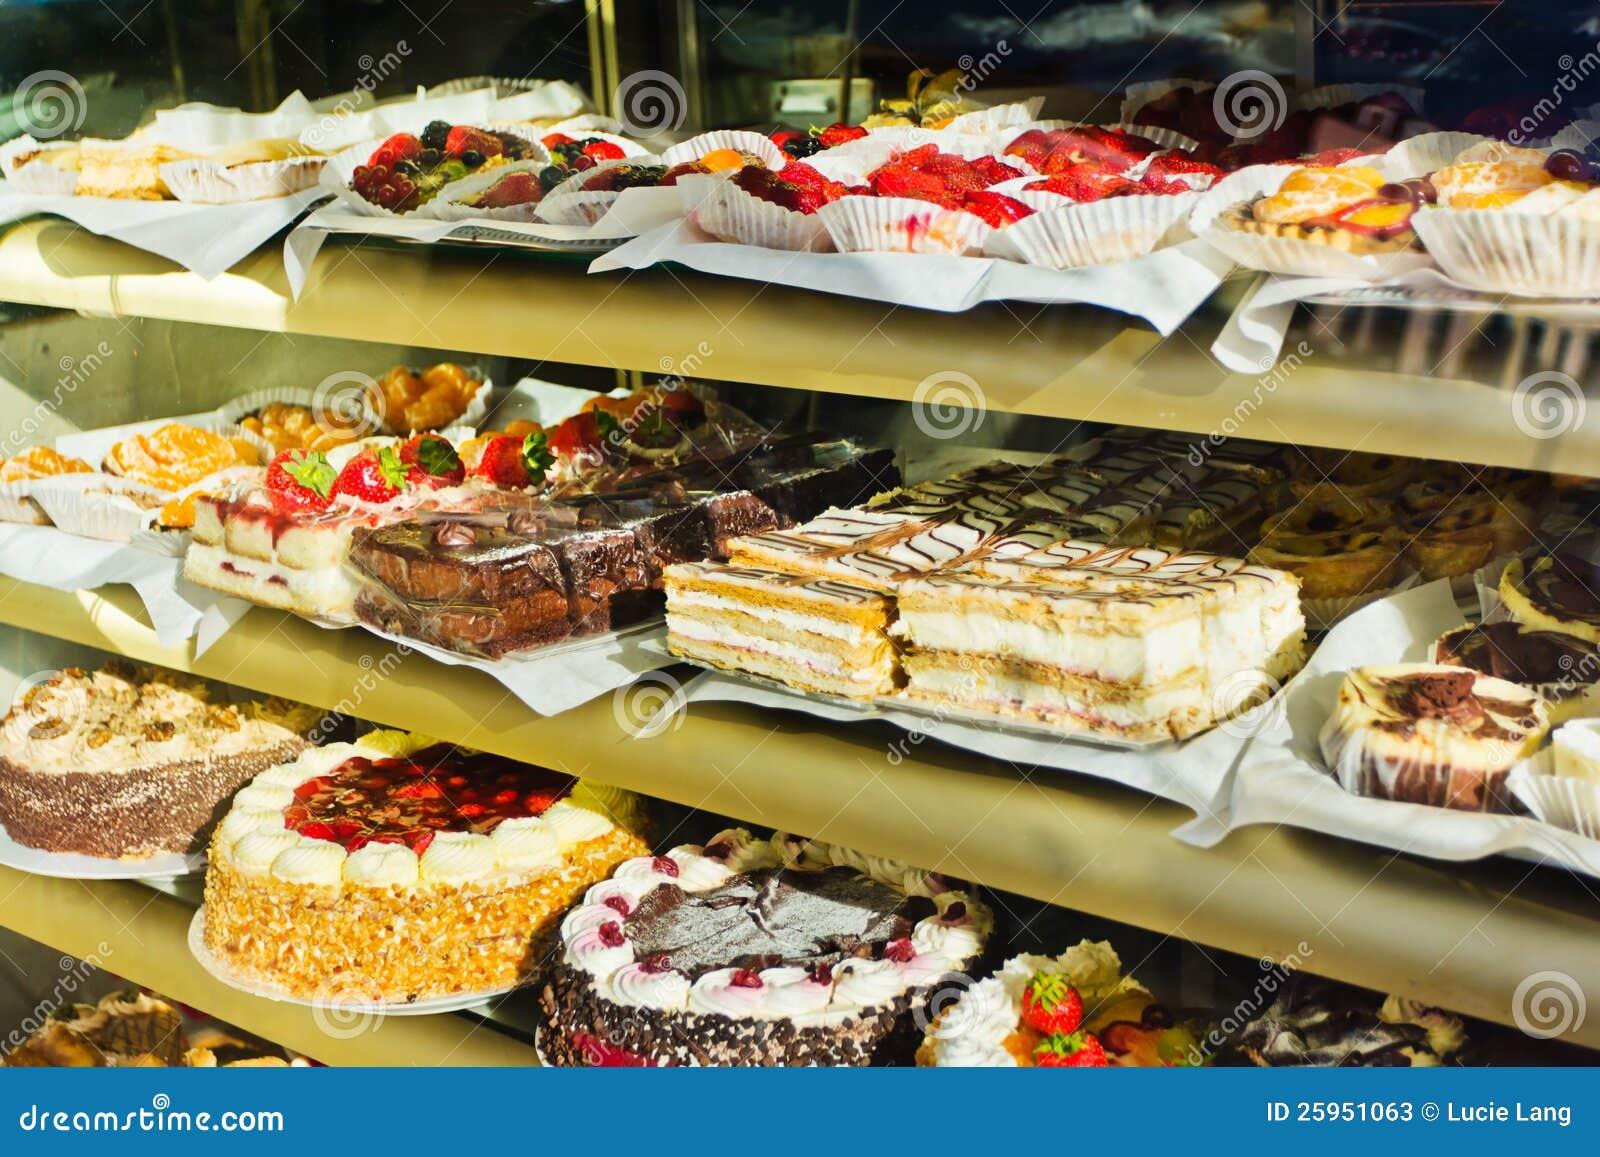 Chocolate Cake Shop Edinburgh